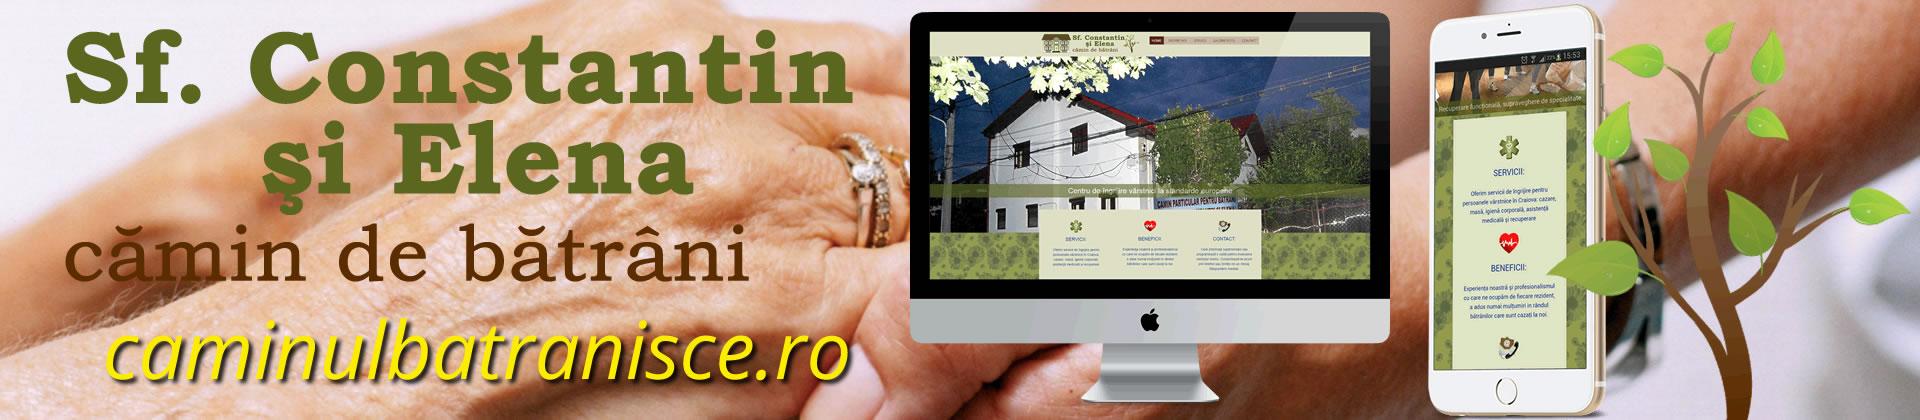 website 058 responsive caminul batrani sfintii constantin si elena